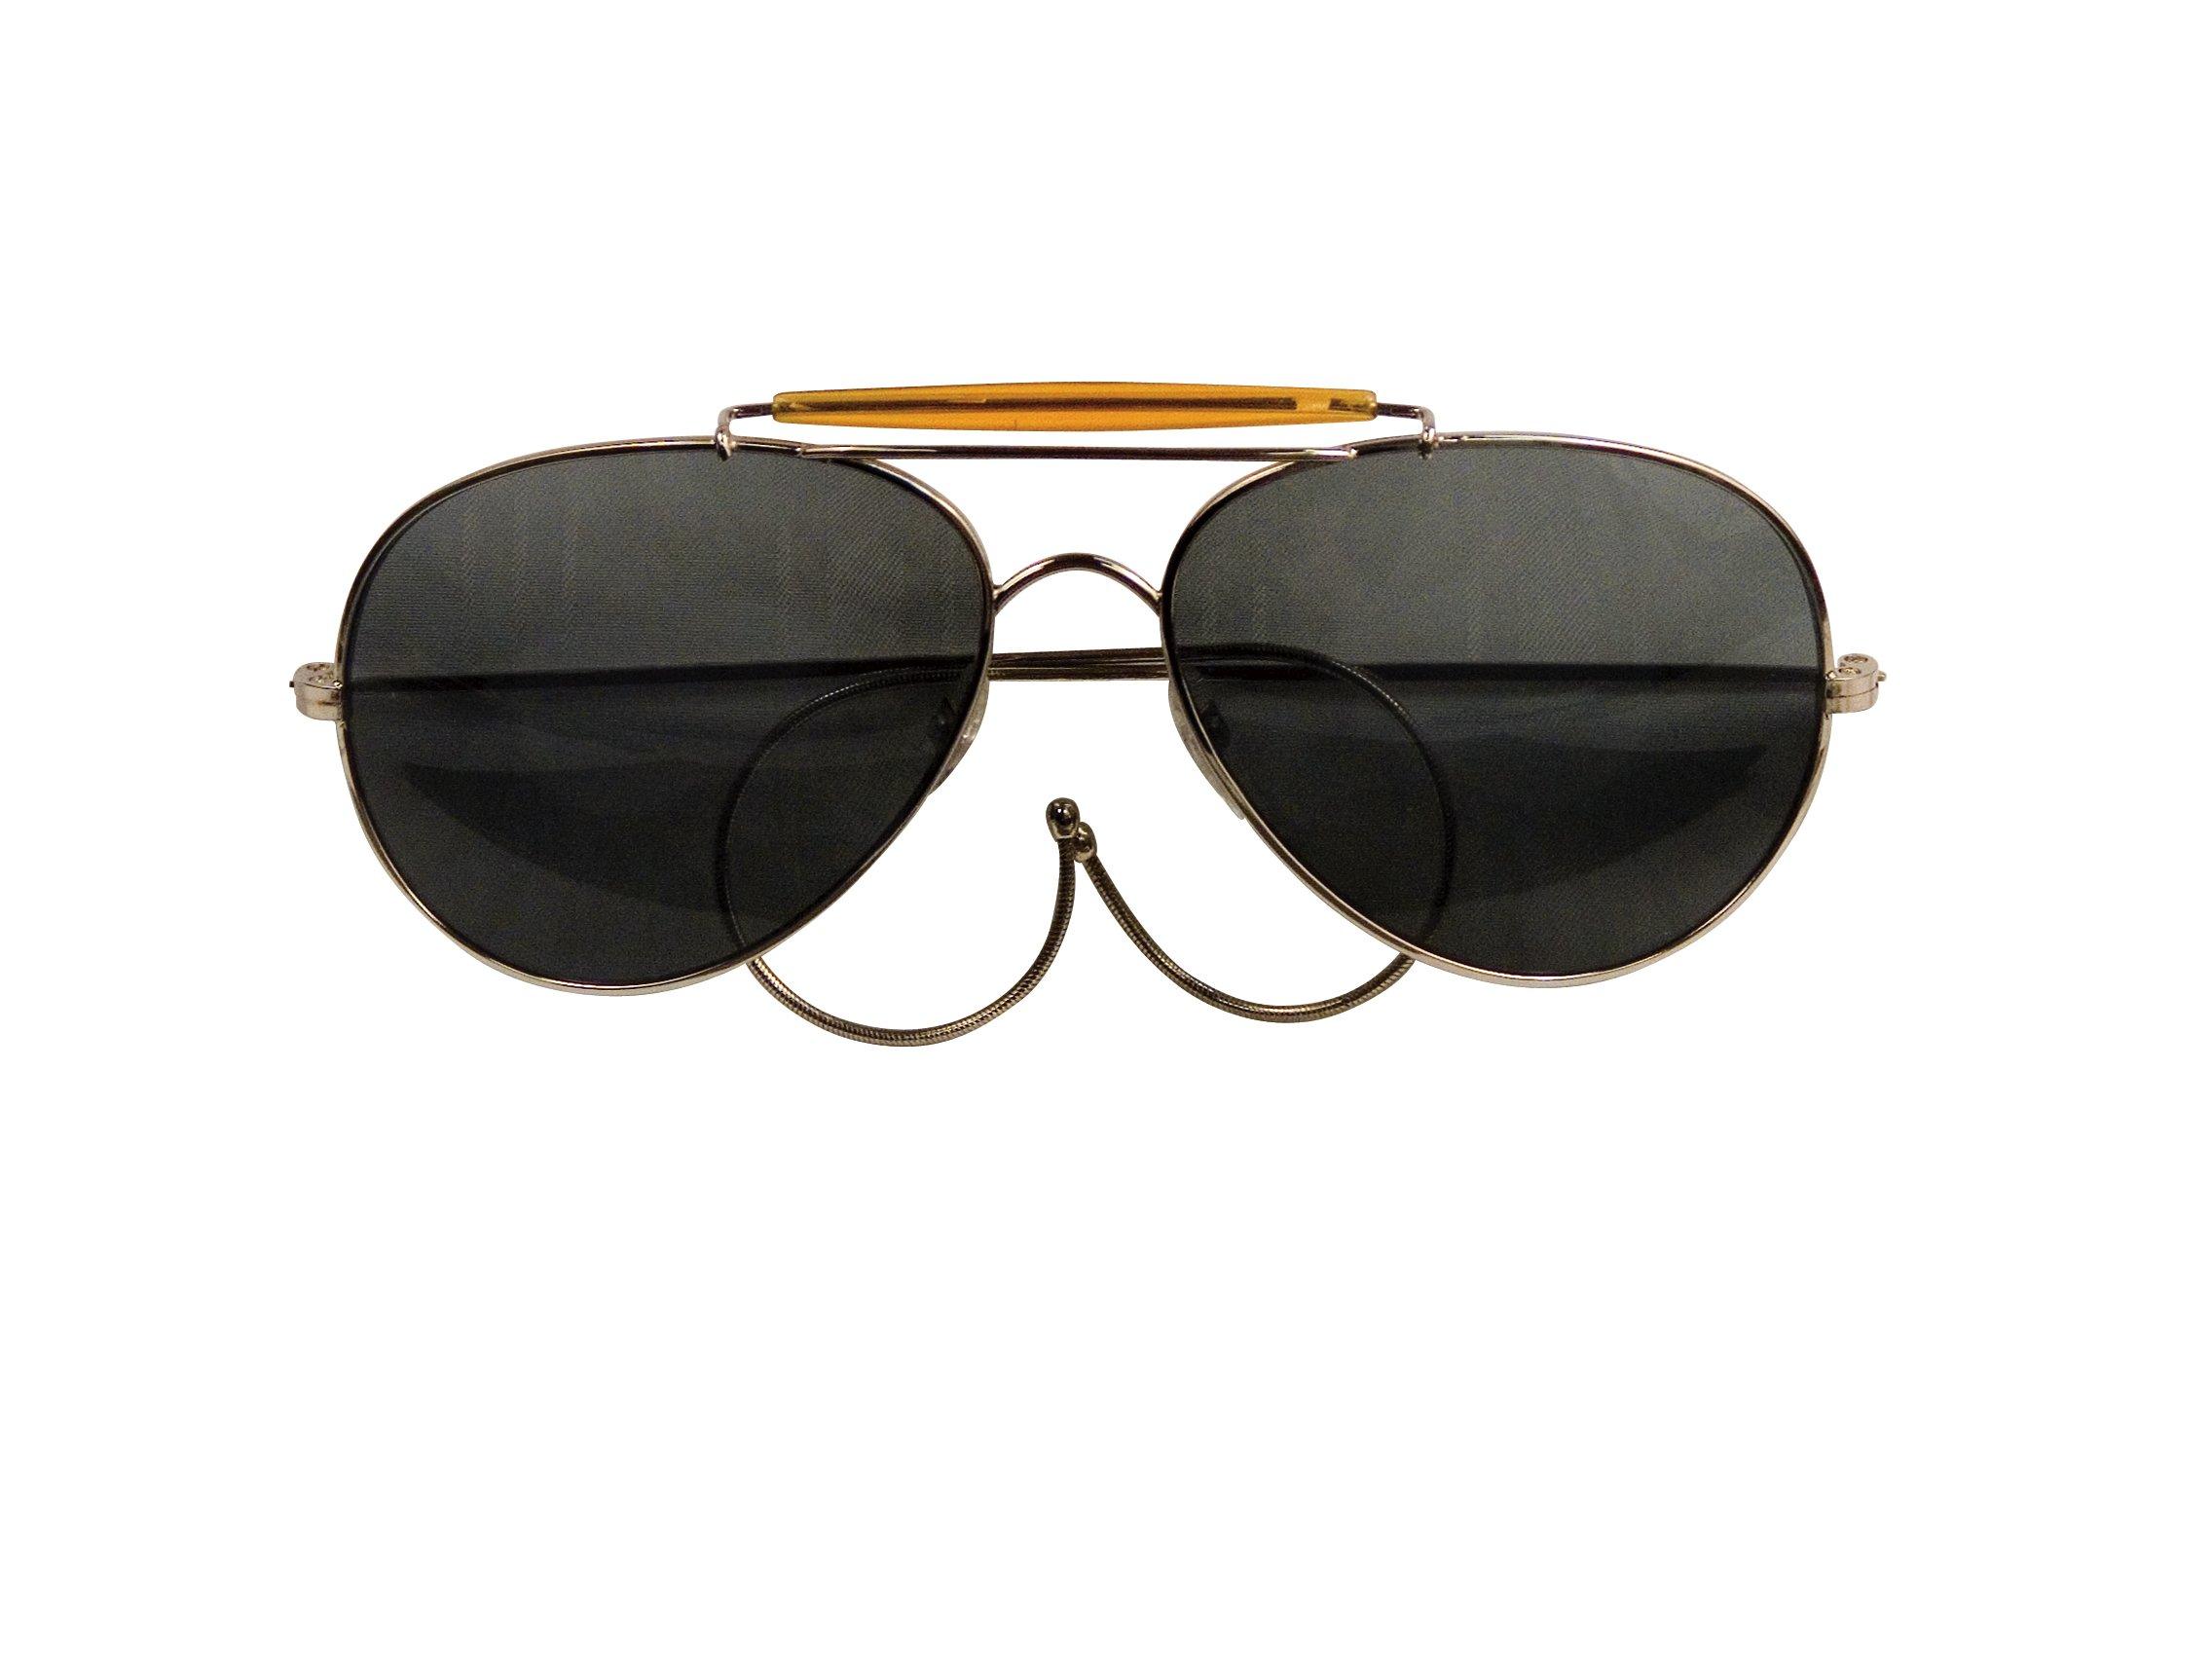 Smoke Lenses US Air Force Style Aviator Sunglasses